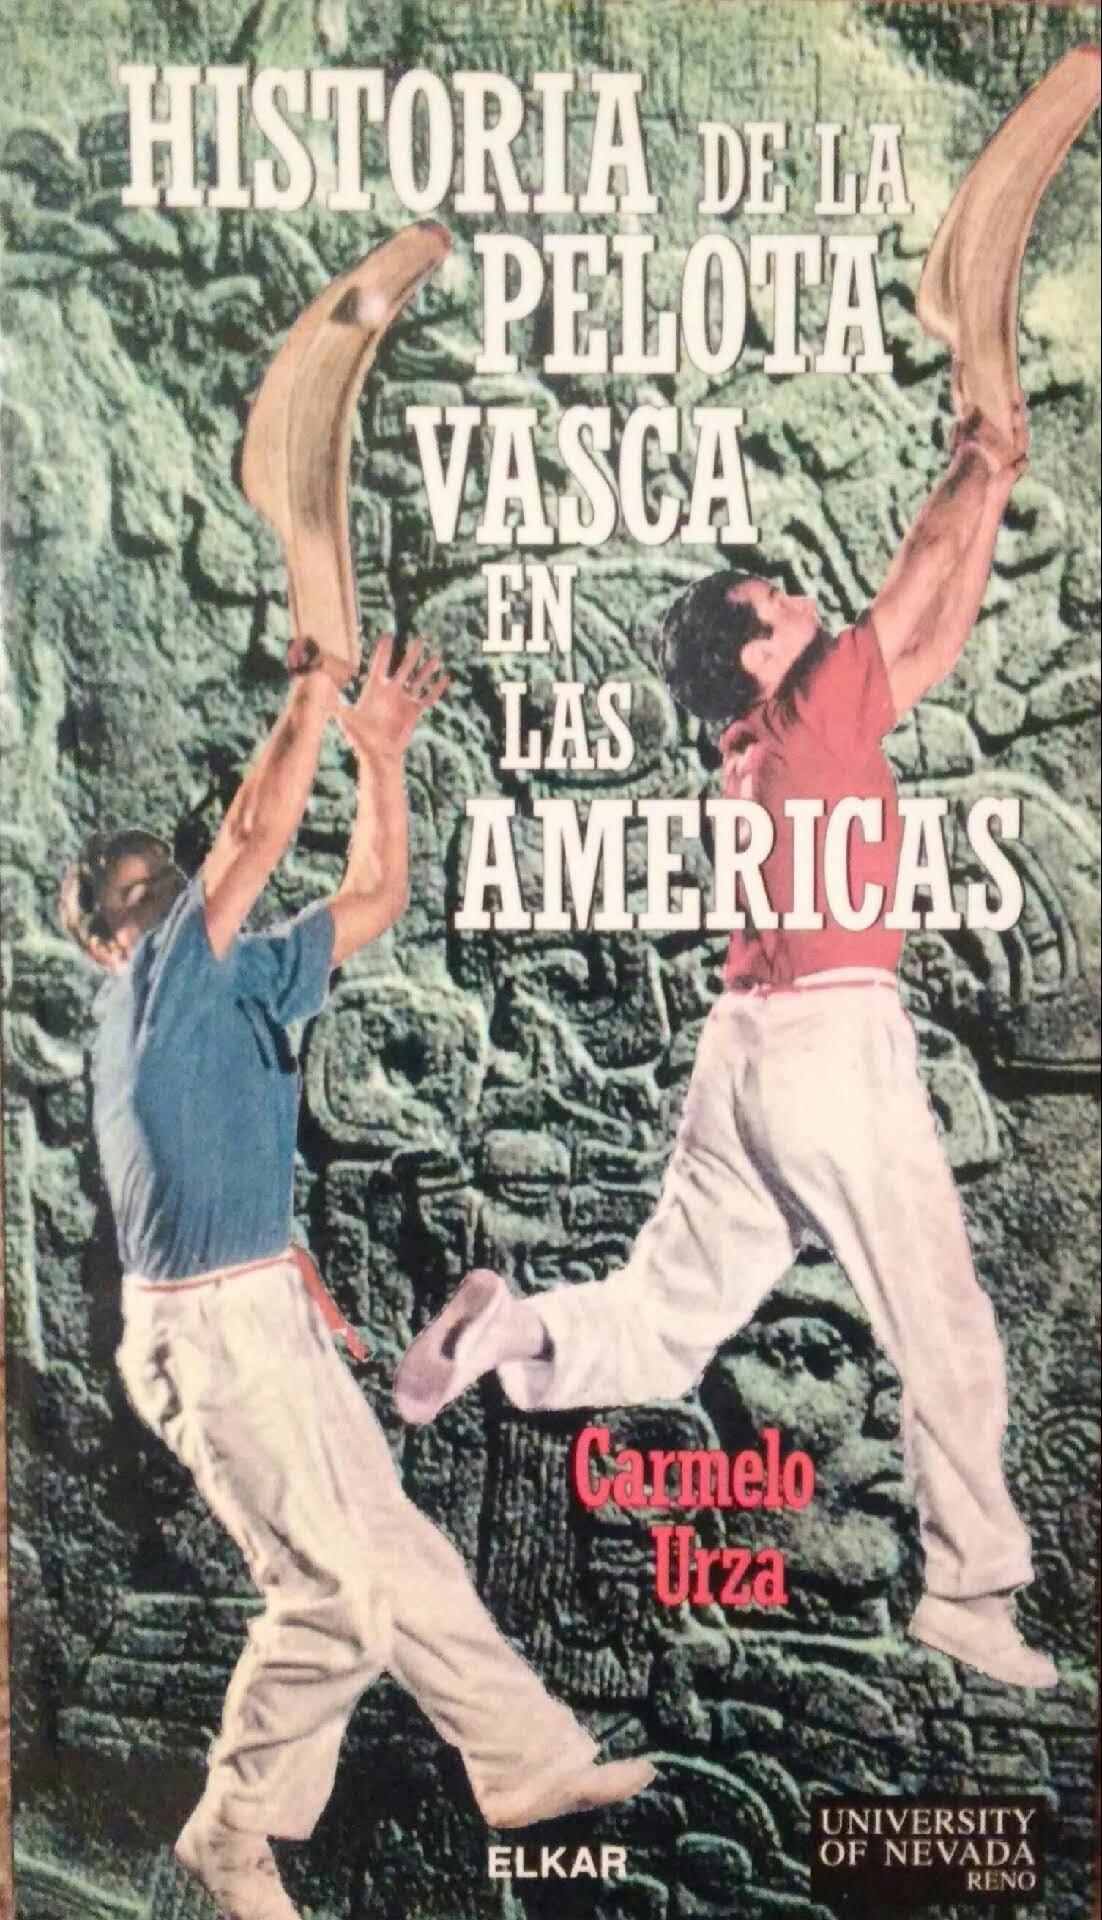 Historia de la pelota vasca en América (Batzuk): Amazon.es: Urza ...